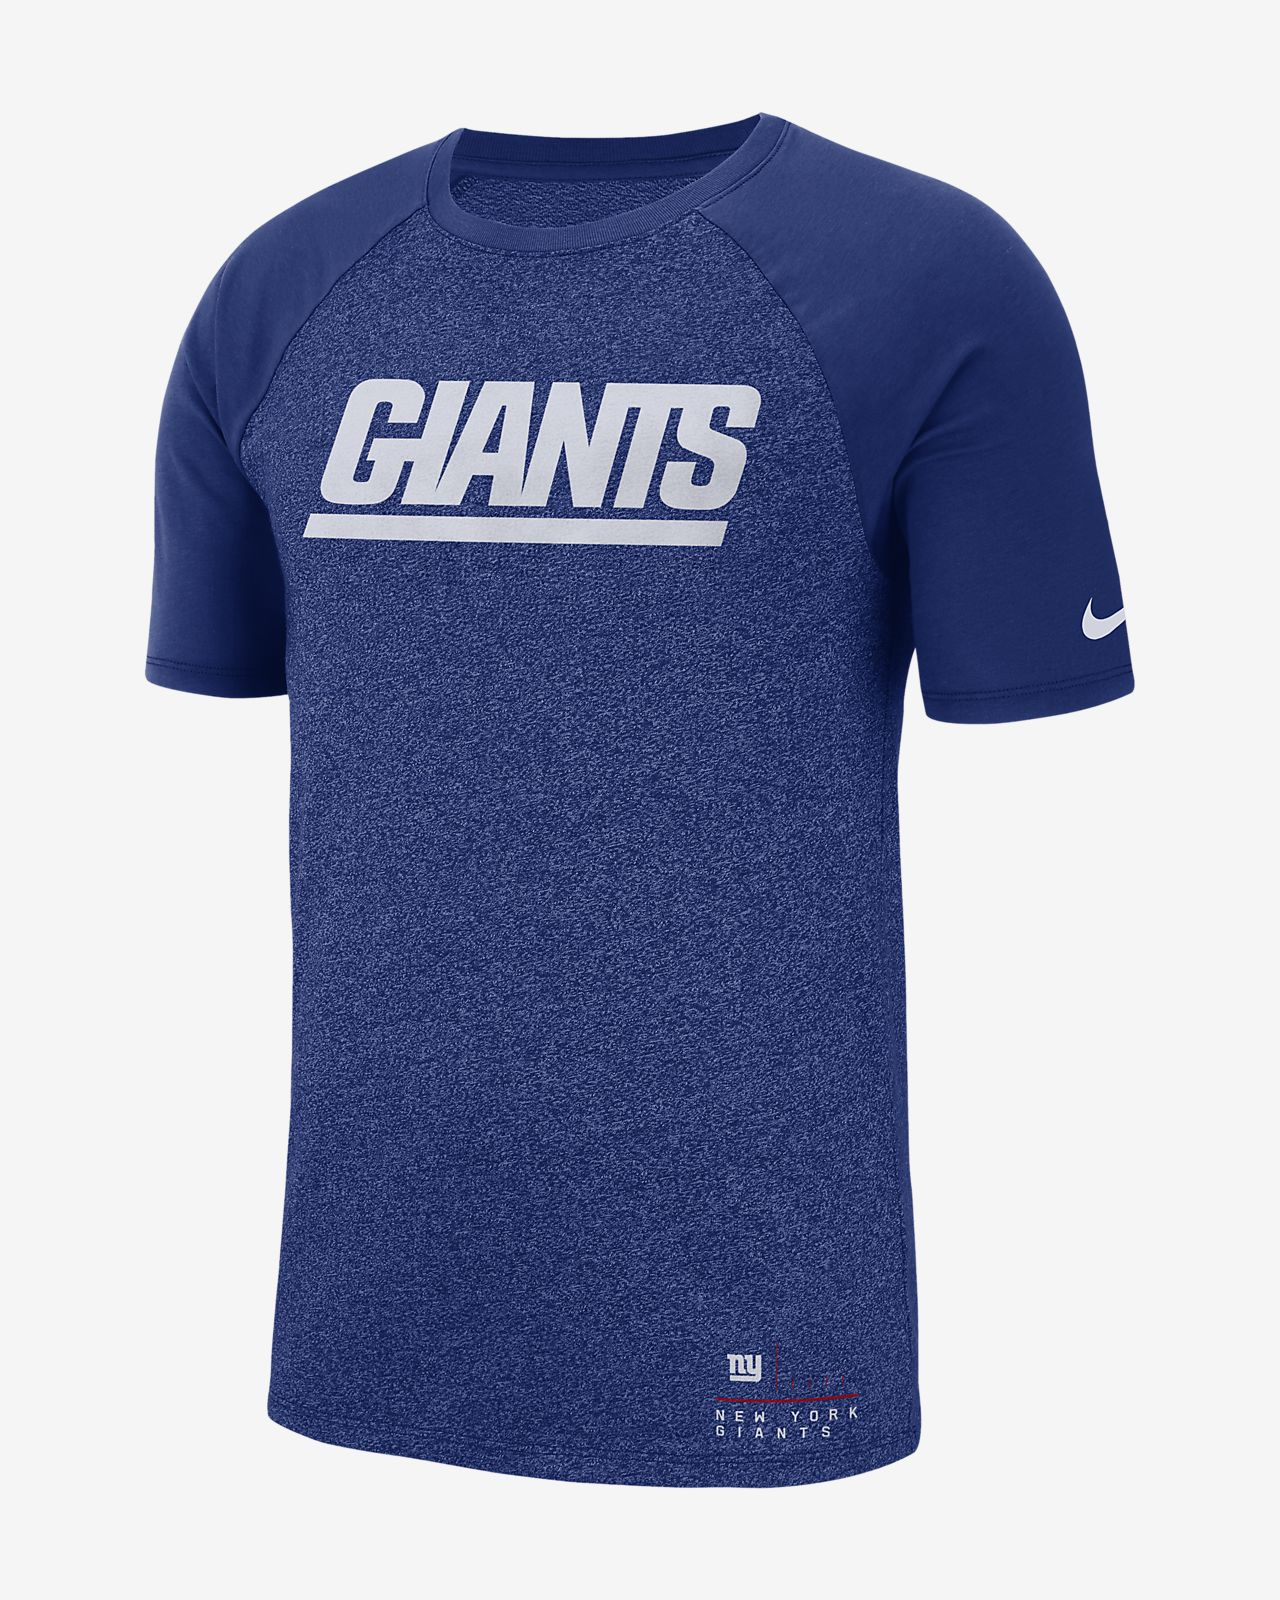 31e6d898de0162 Nike Raglan (NFL Giants) Men s T-Shirt. Nike.com